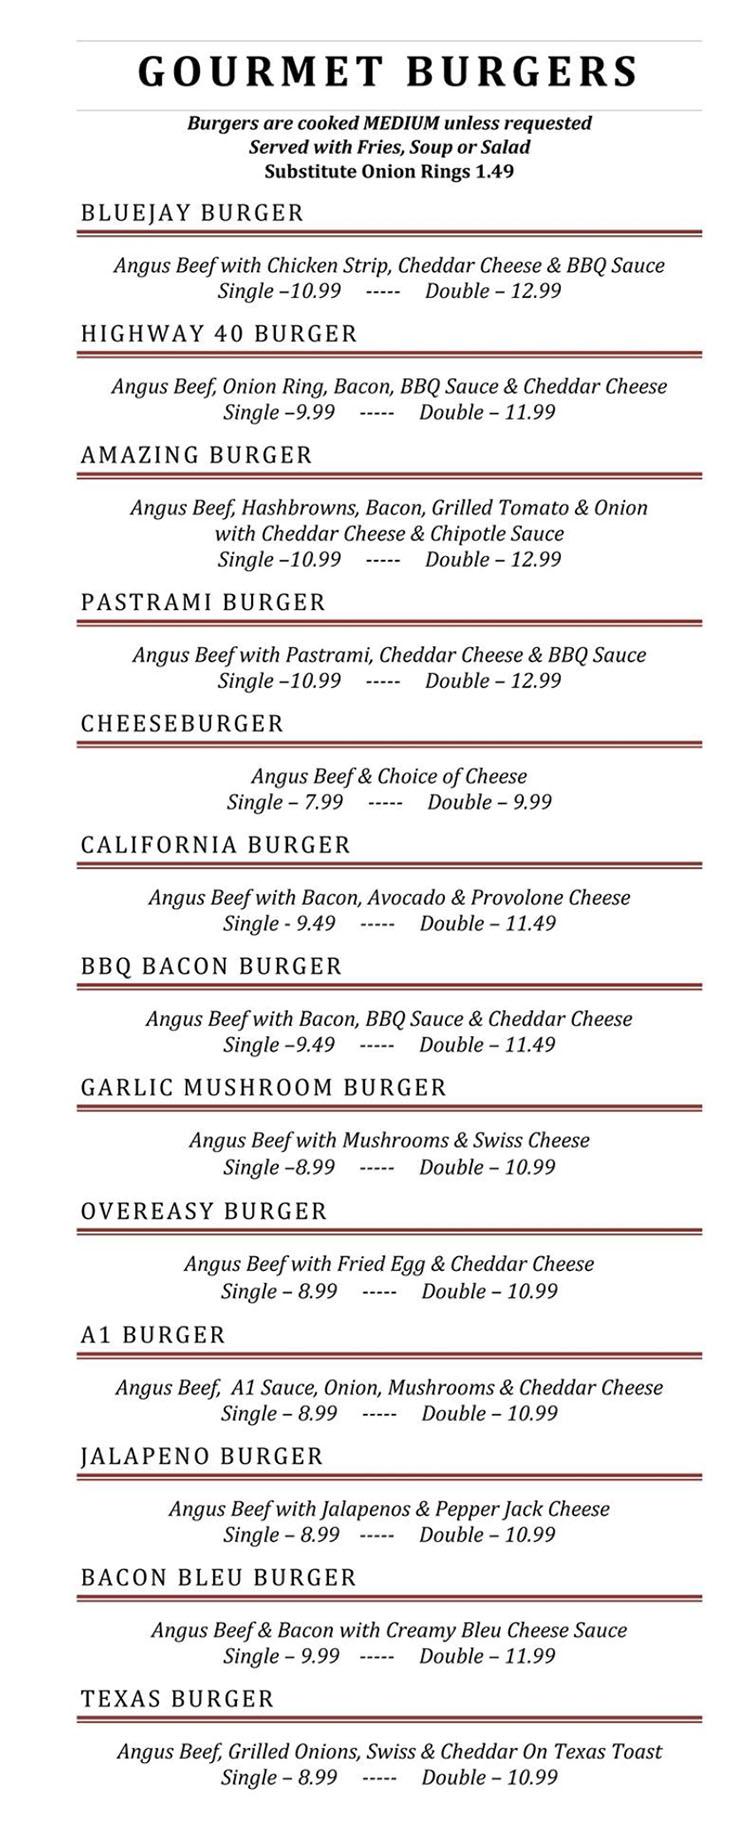 Blue Jay Cafe menu - gourmet burgers